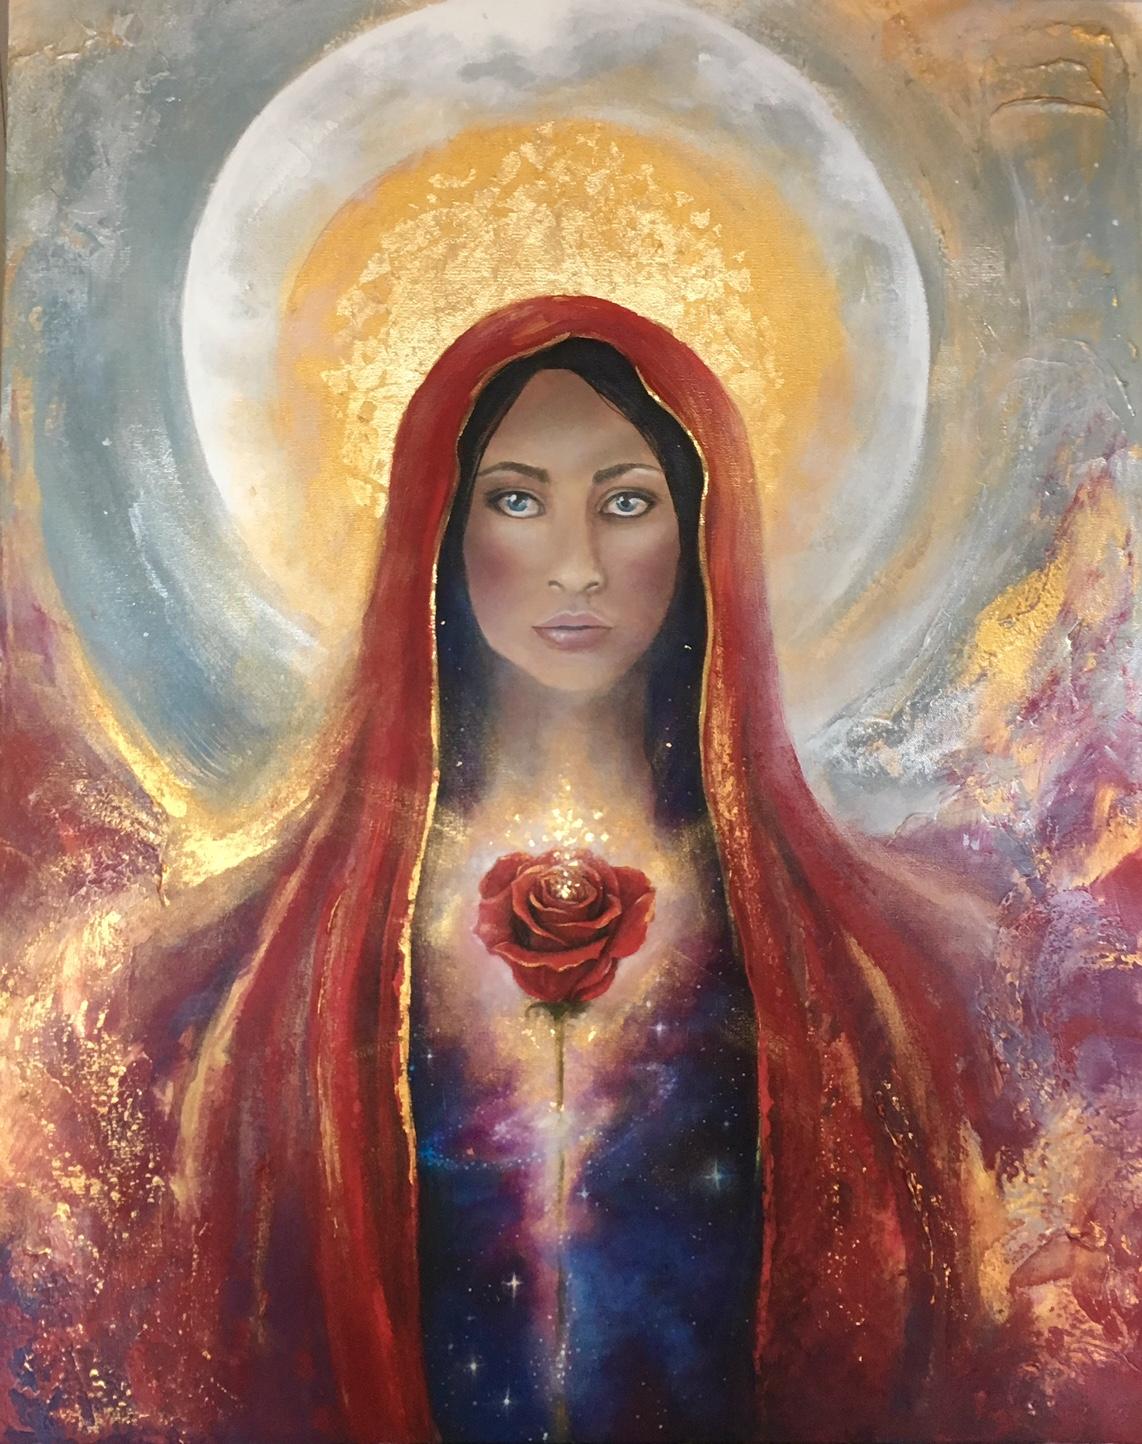 Artwork by Goddess Rising Priestess Sister, Linzy Arnott